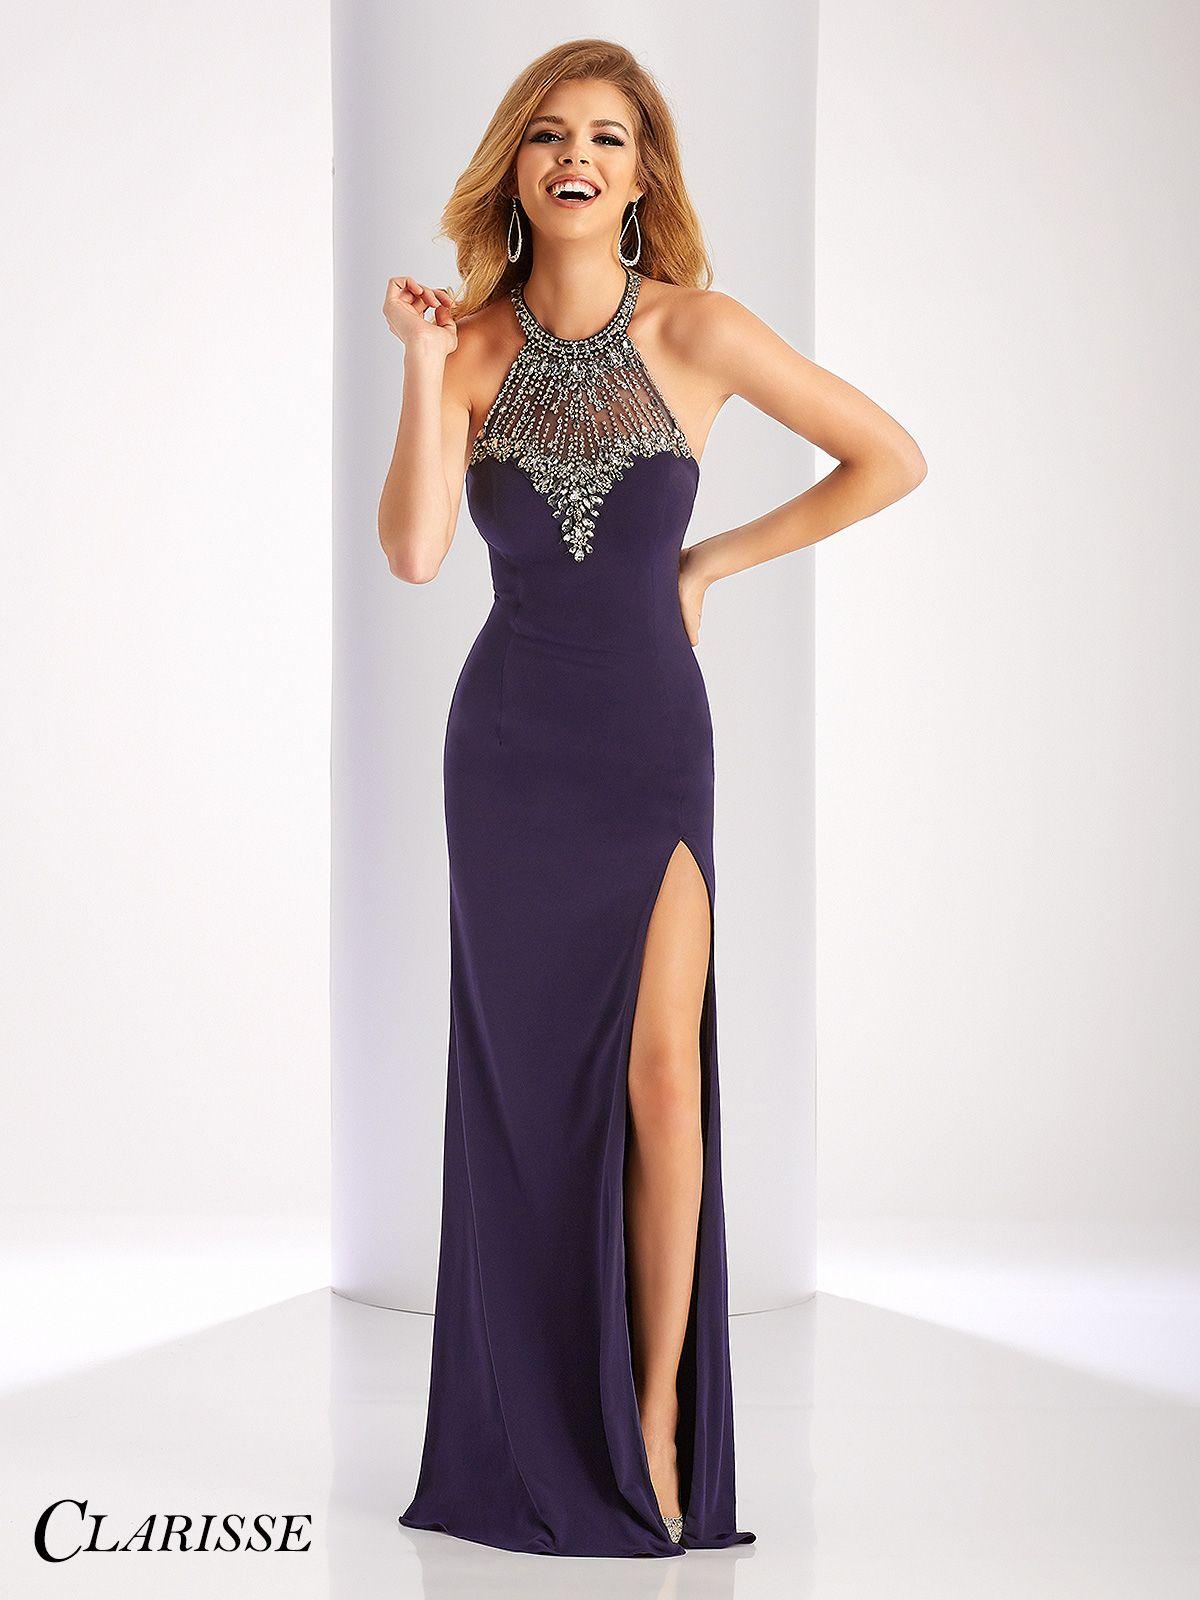 Clarisse Jeweled Collar Prom Dress 3078 | Kleider